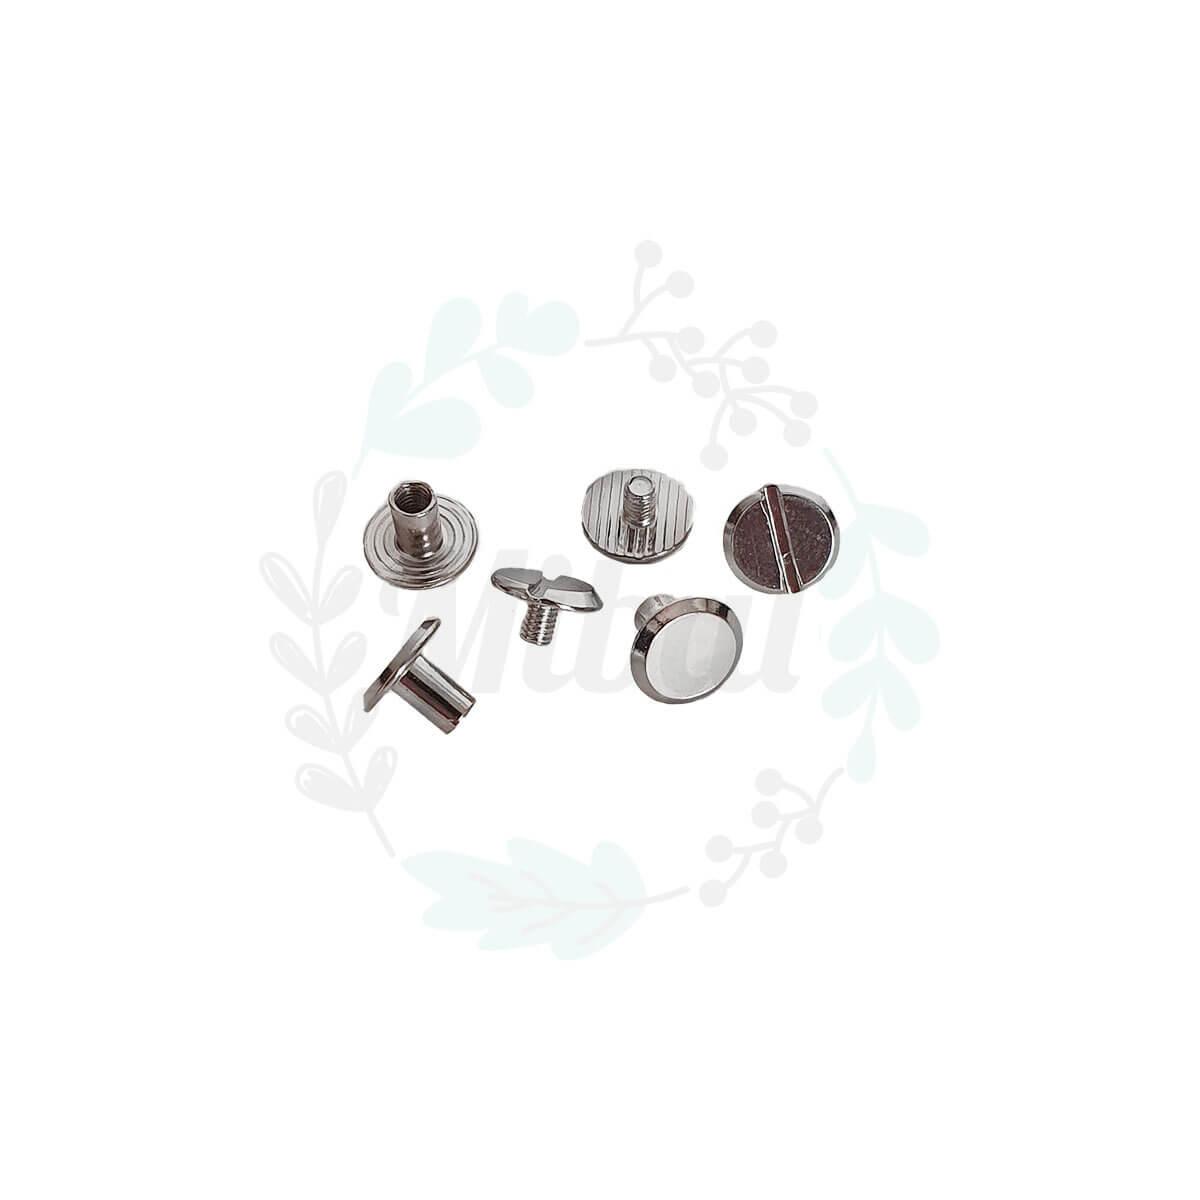 Buchschrauben - Silber